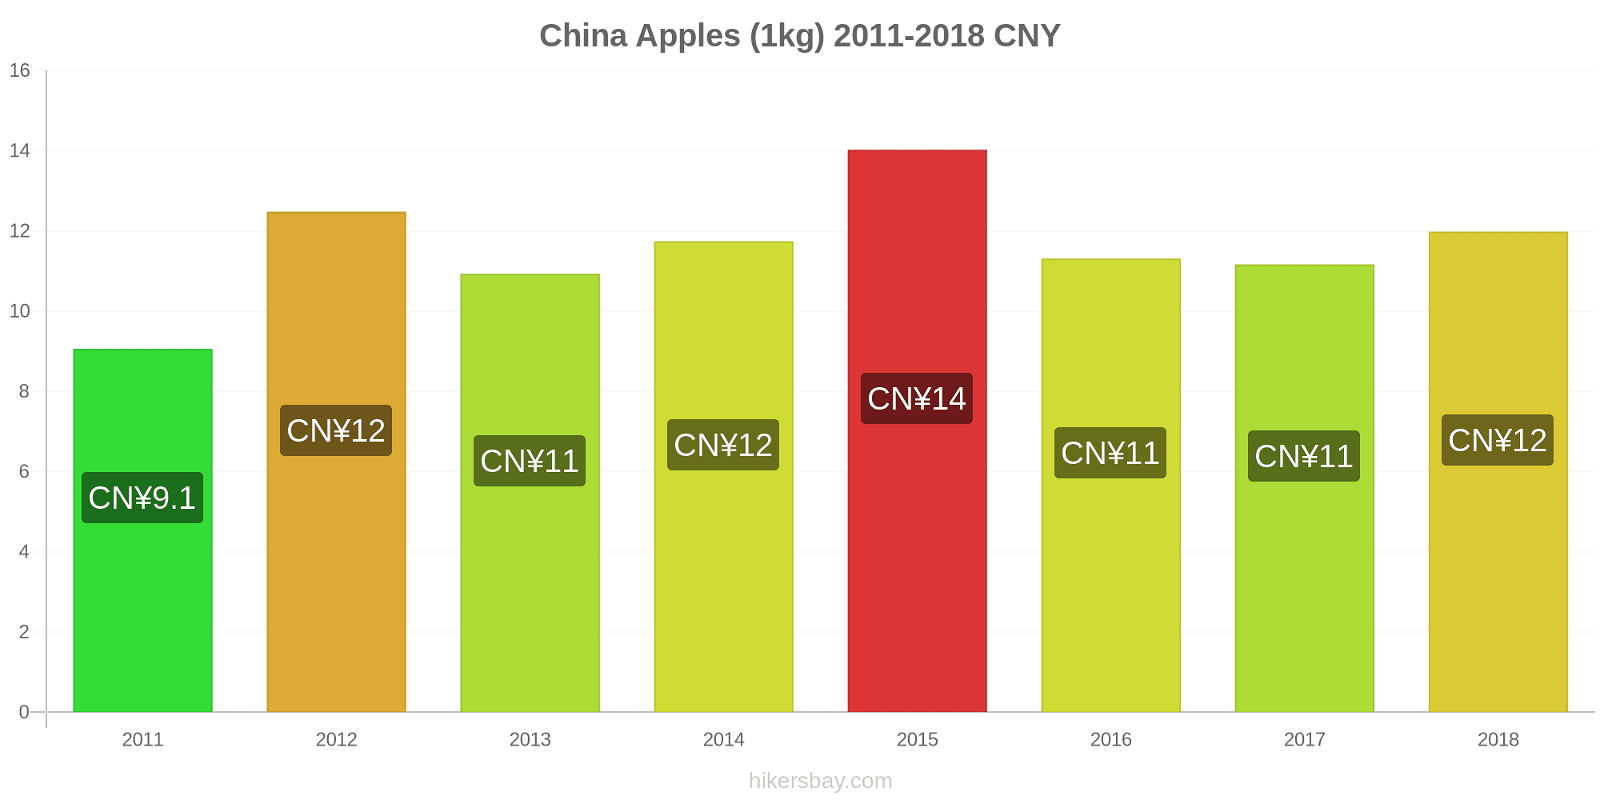 China price changes Apples (1kg) hikersbay.com